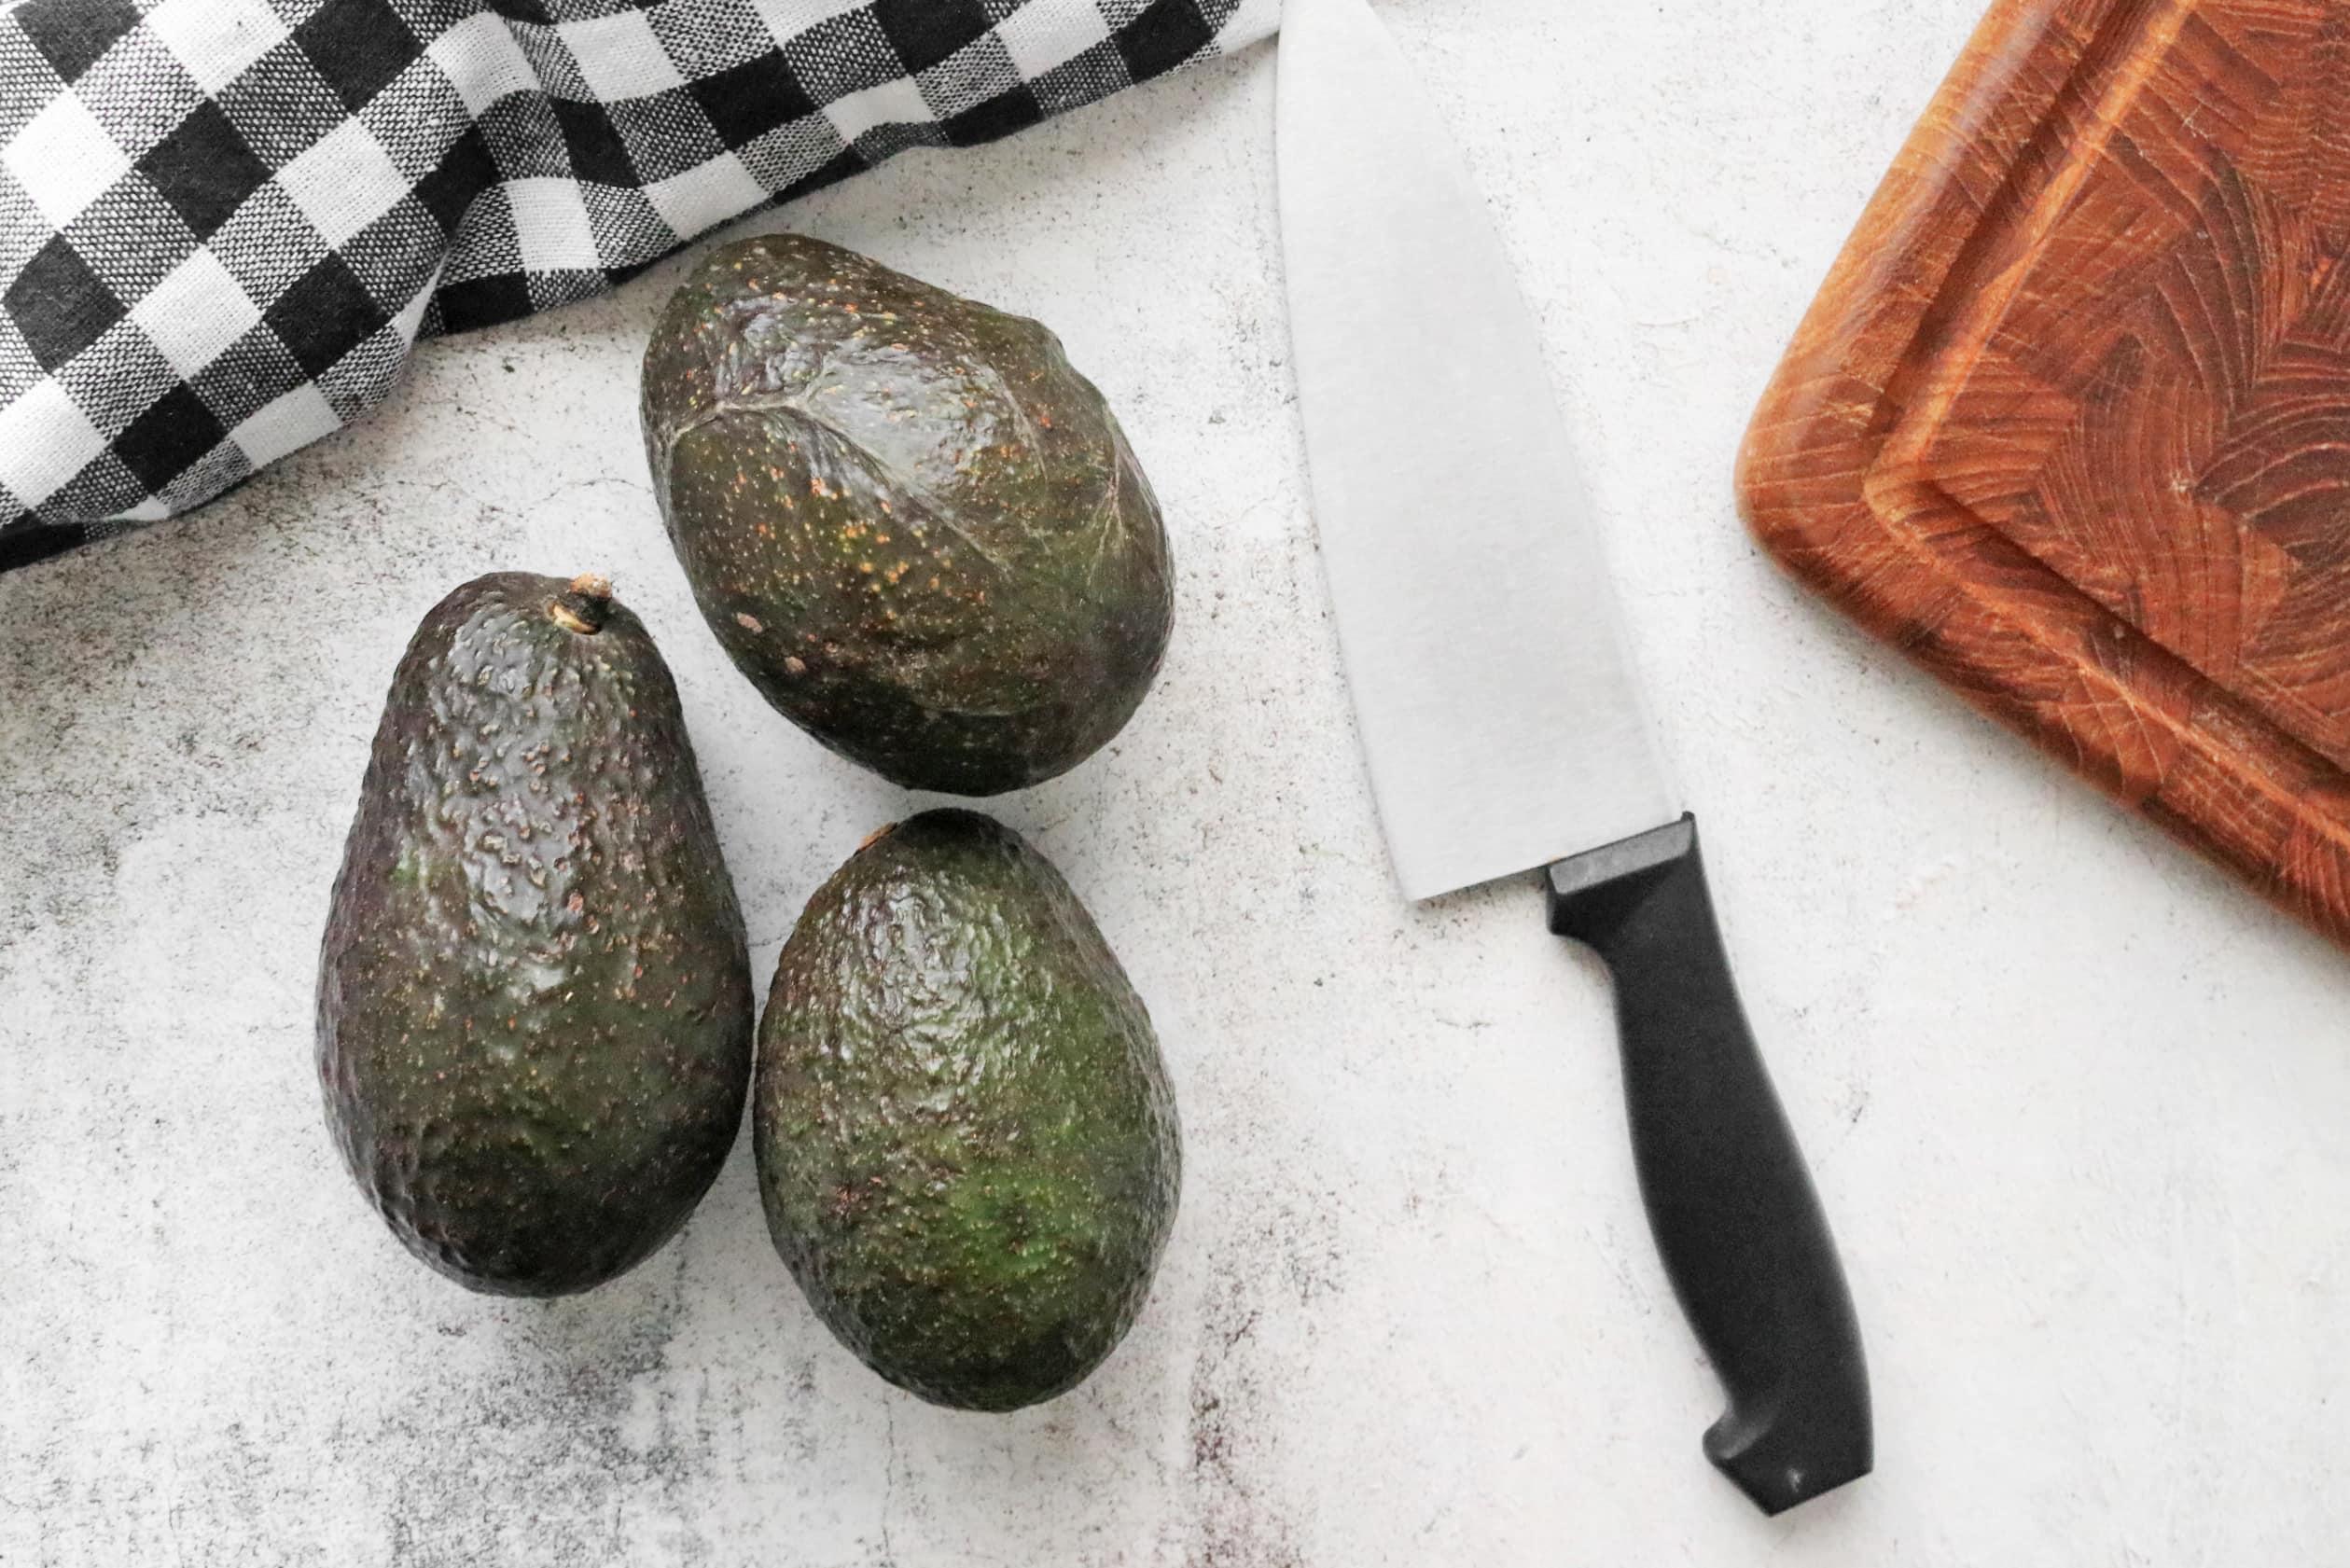 3 Avocados next to a chef's knife